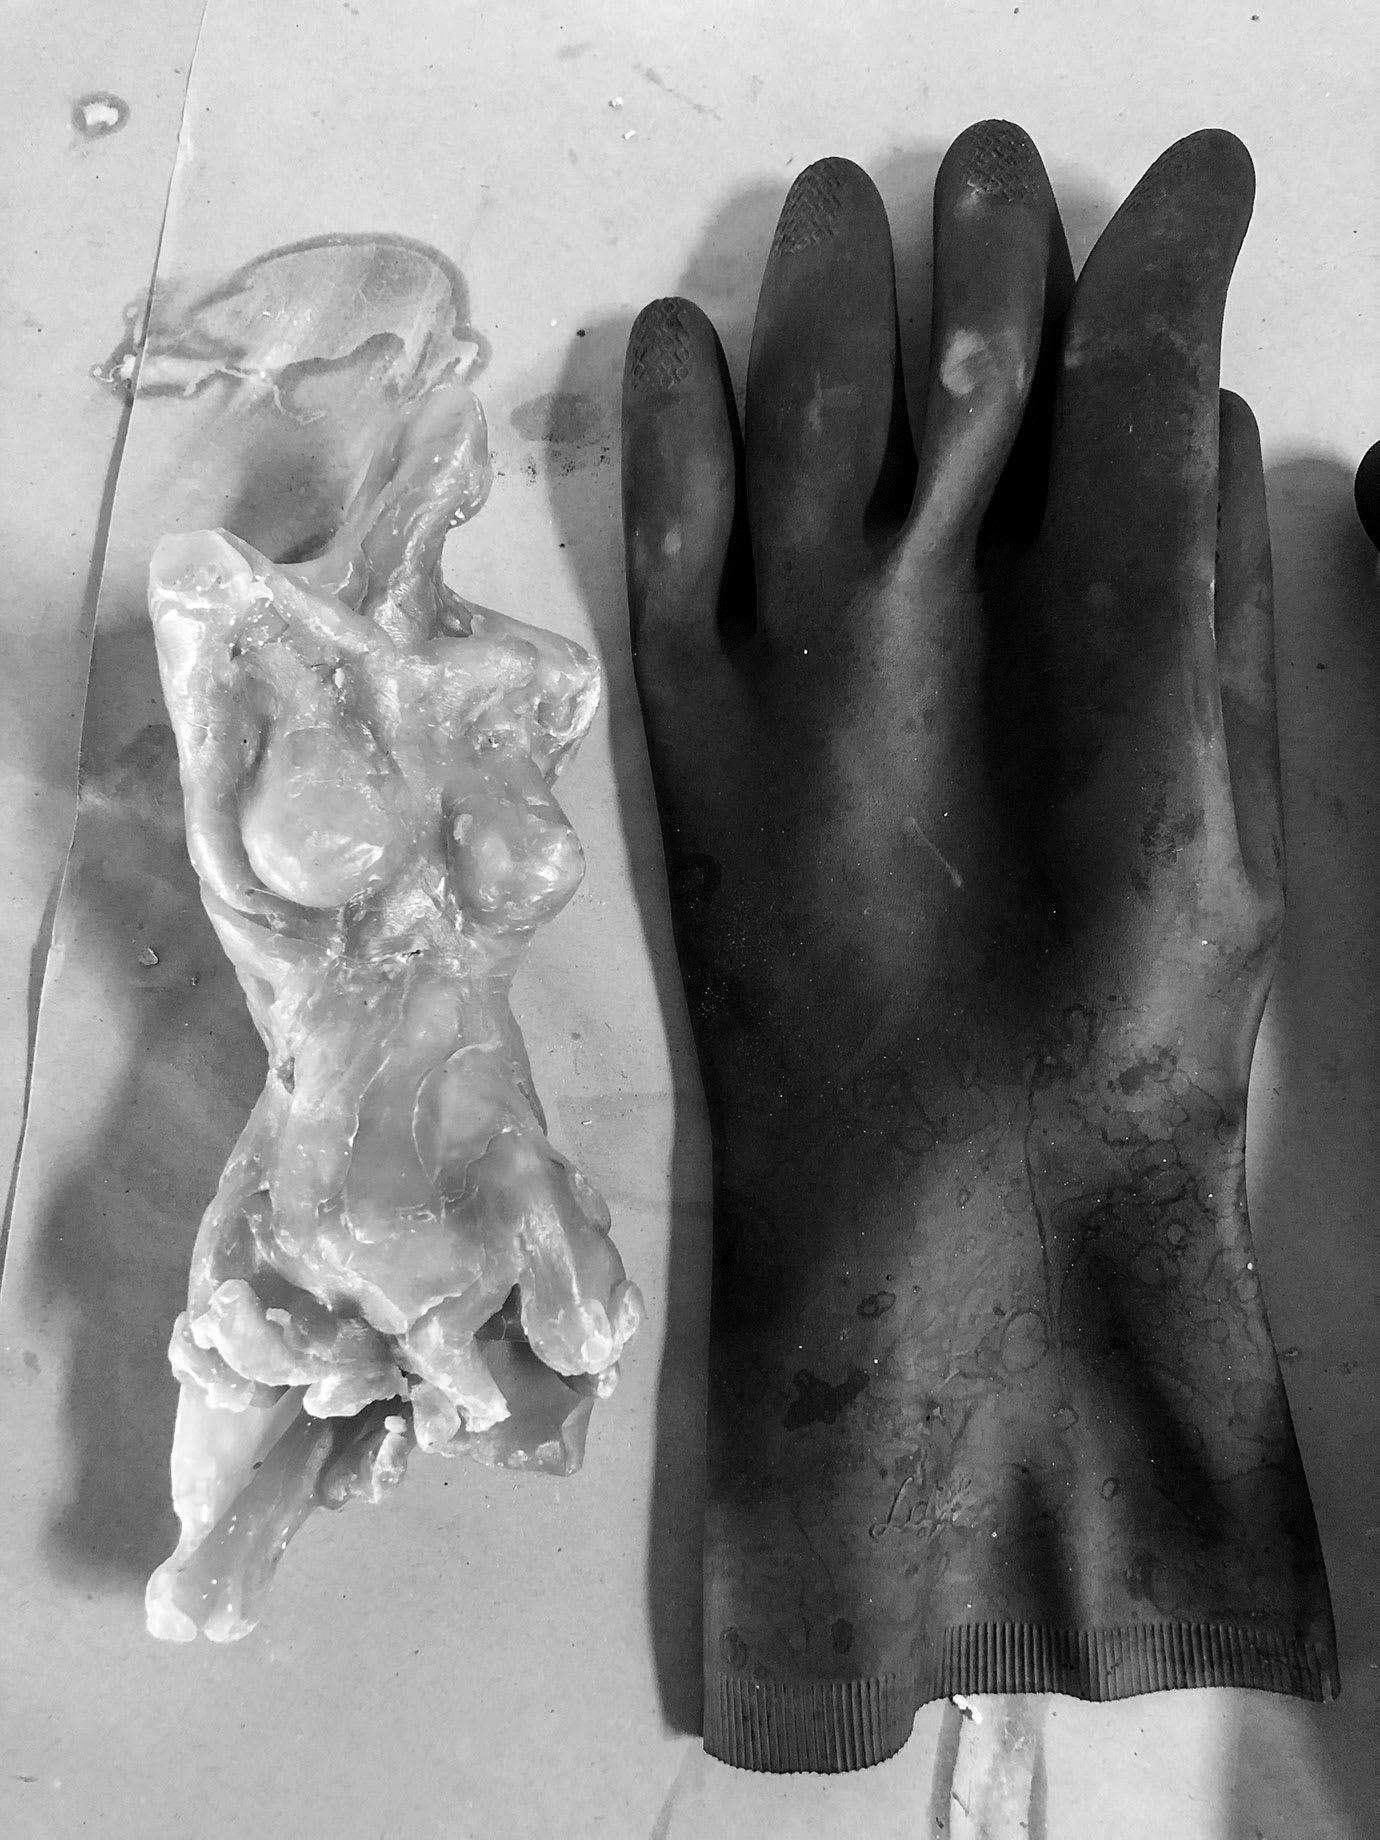 A wax model of a female body next to a black glove.